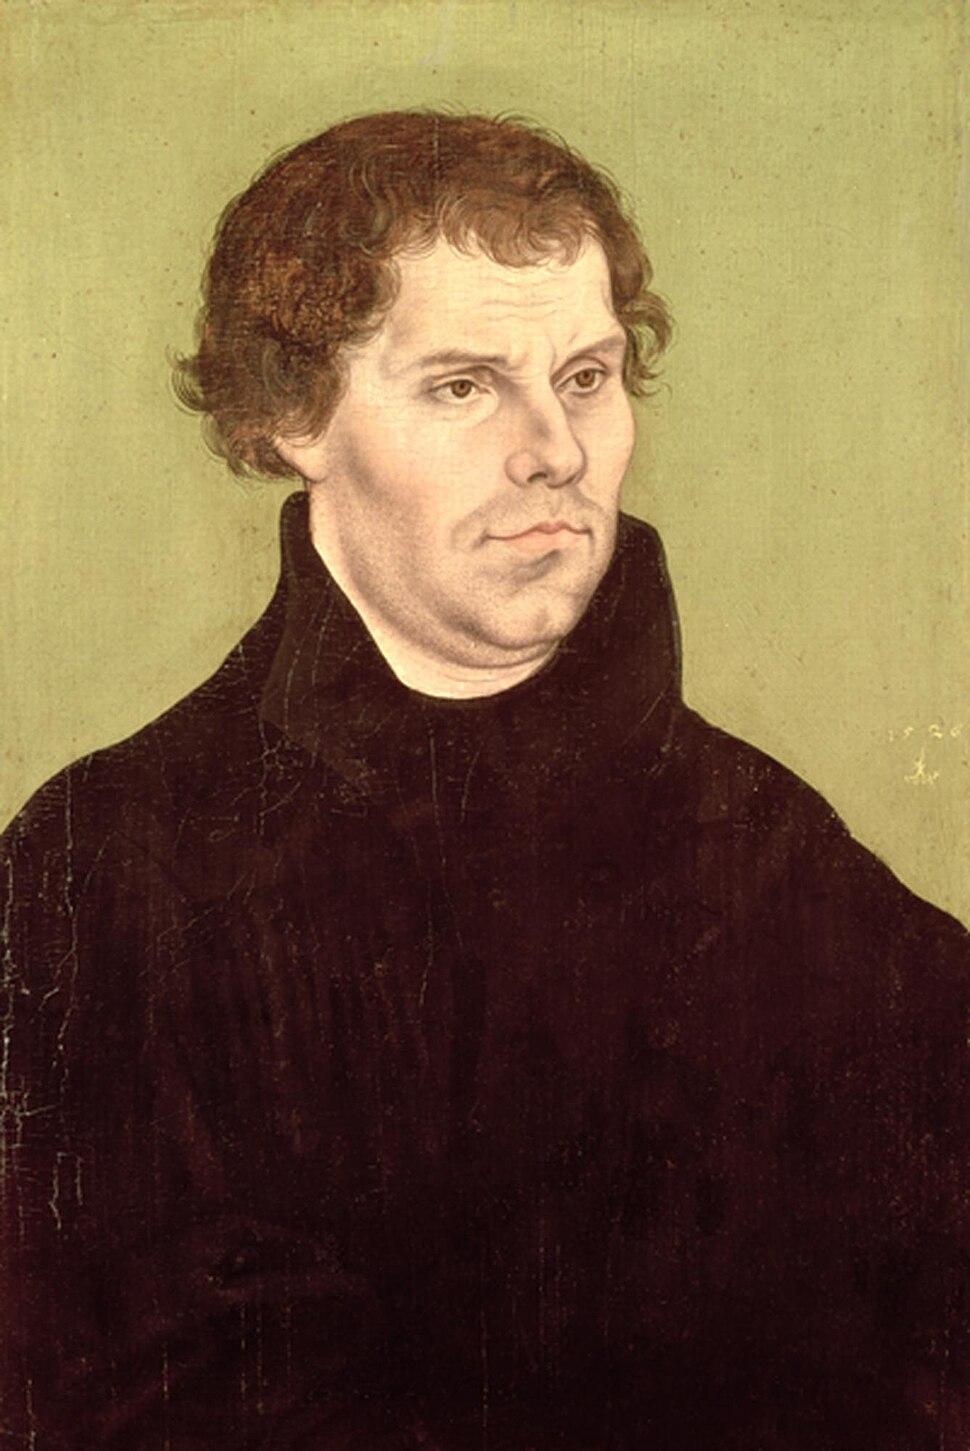 Martin Luther (Lucas Cranach) 1526